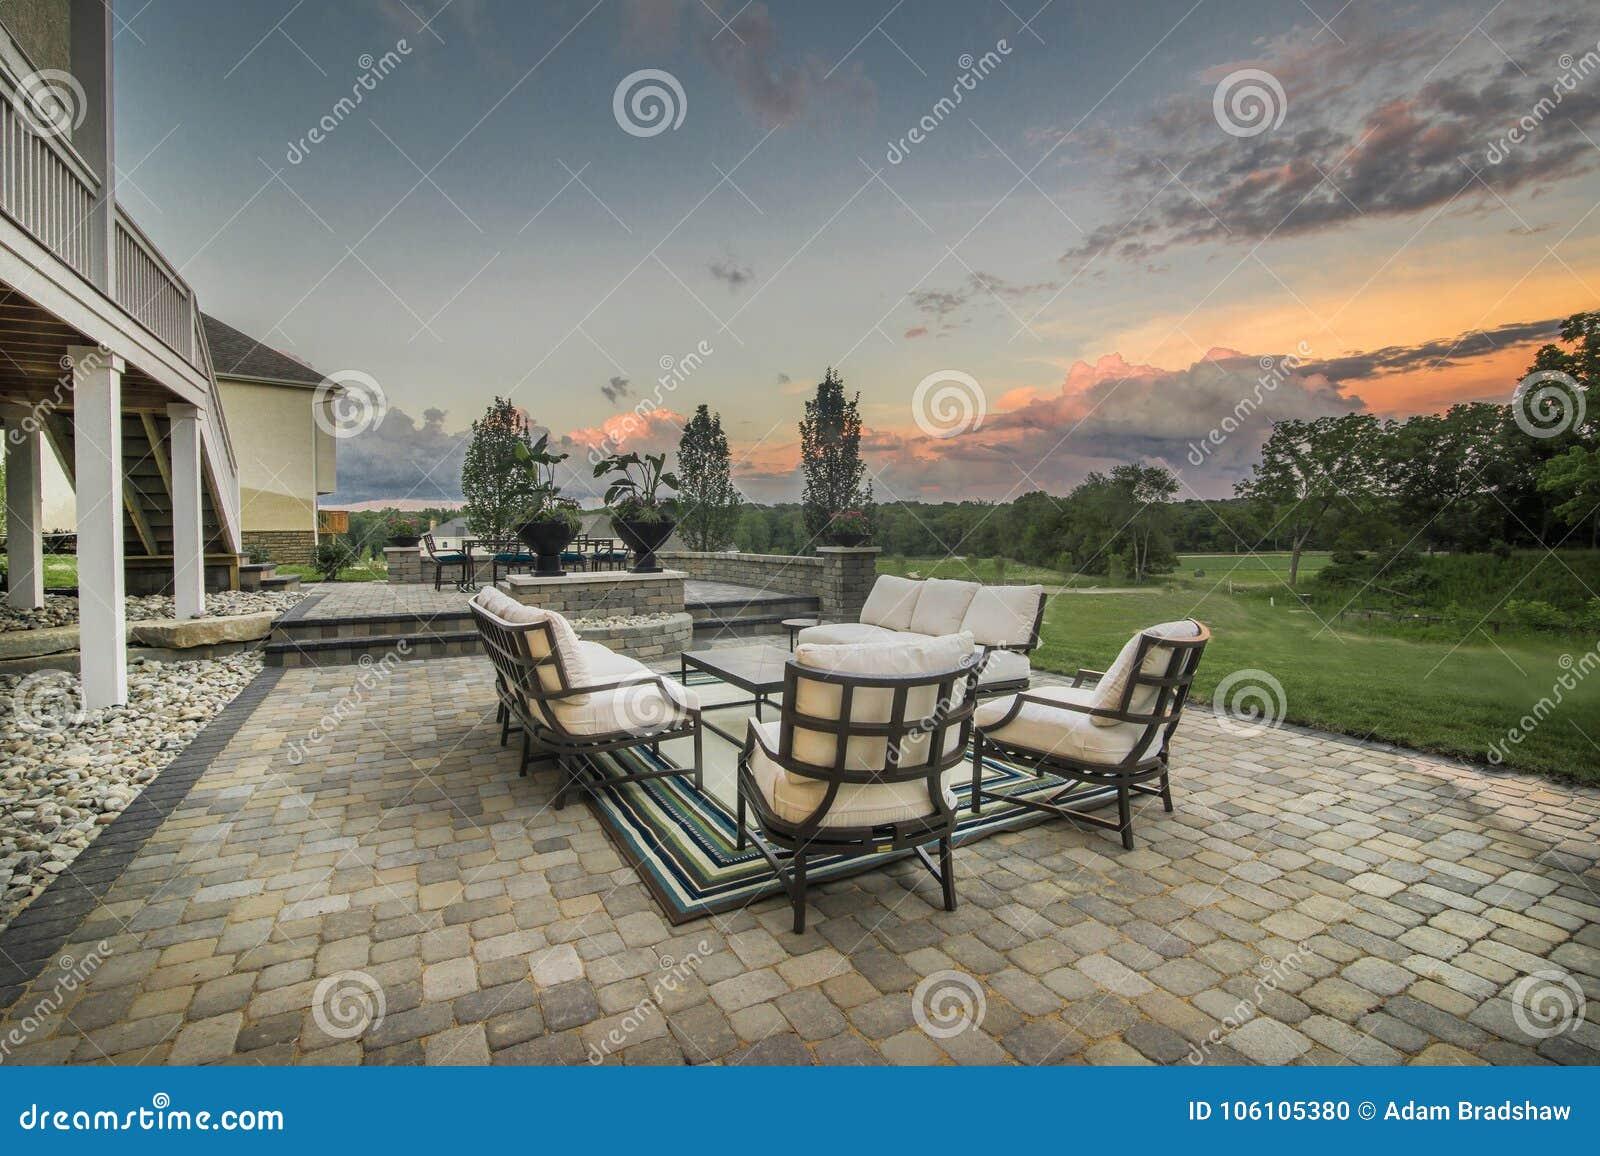 Luxury Home Luxurious Brick House Exterior Patio Sunset Sitting Area